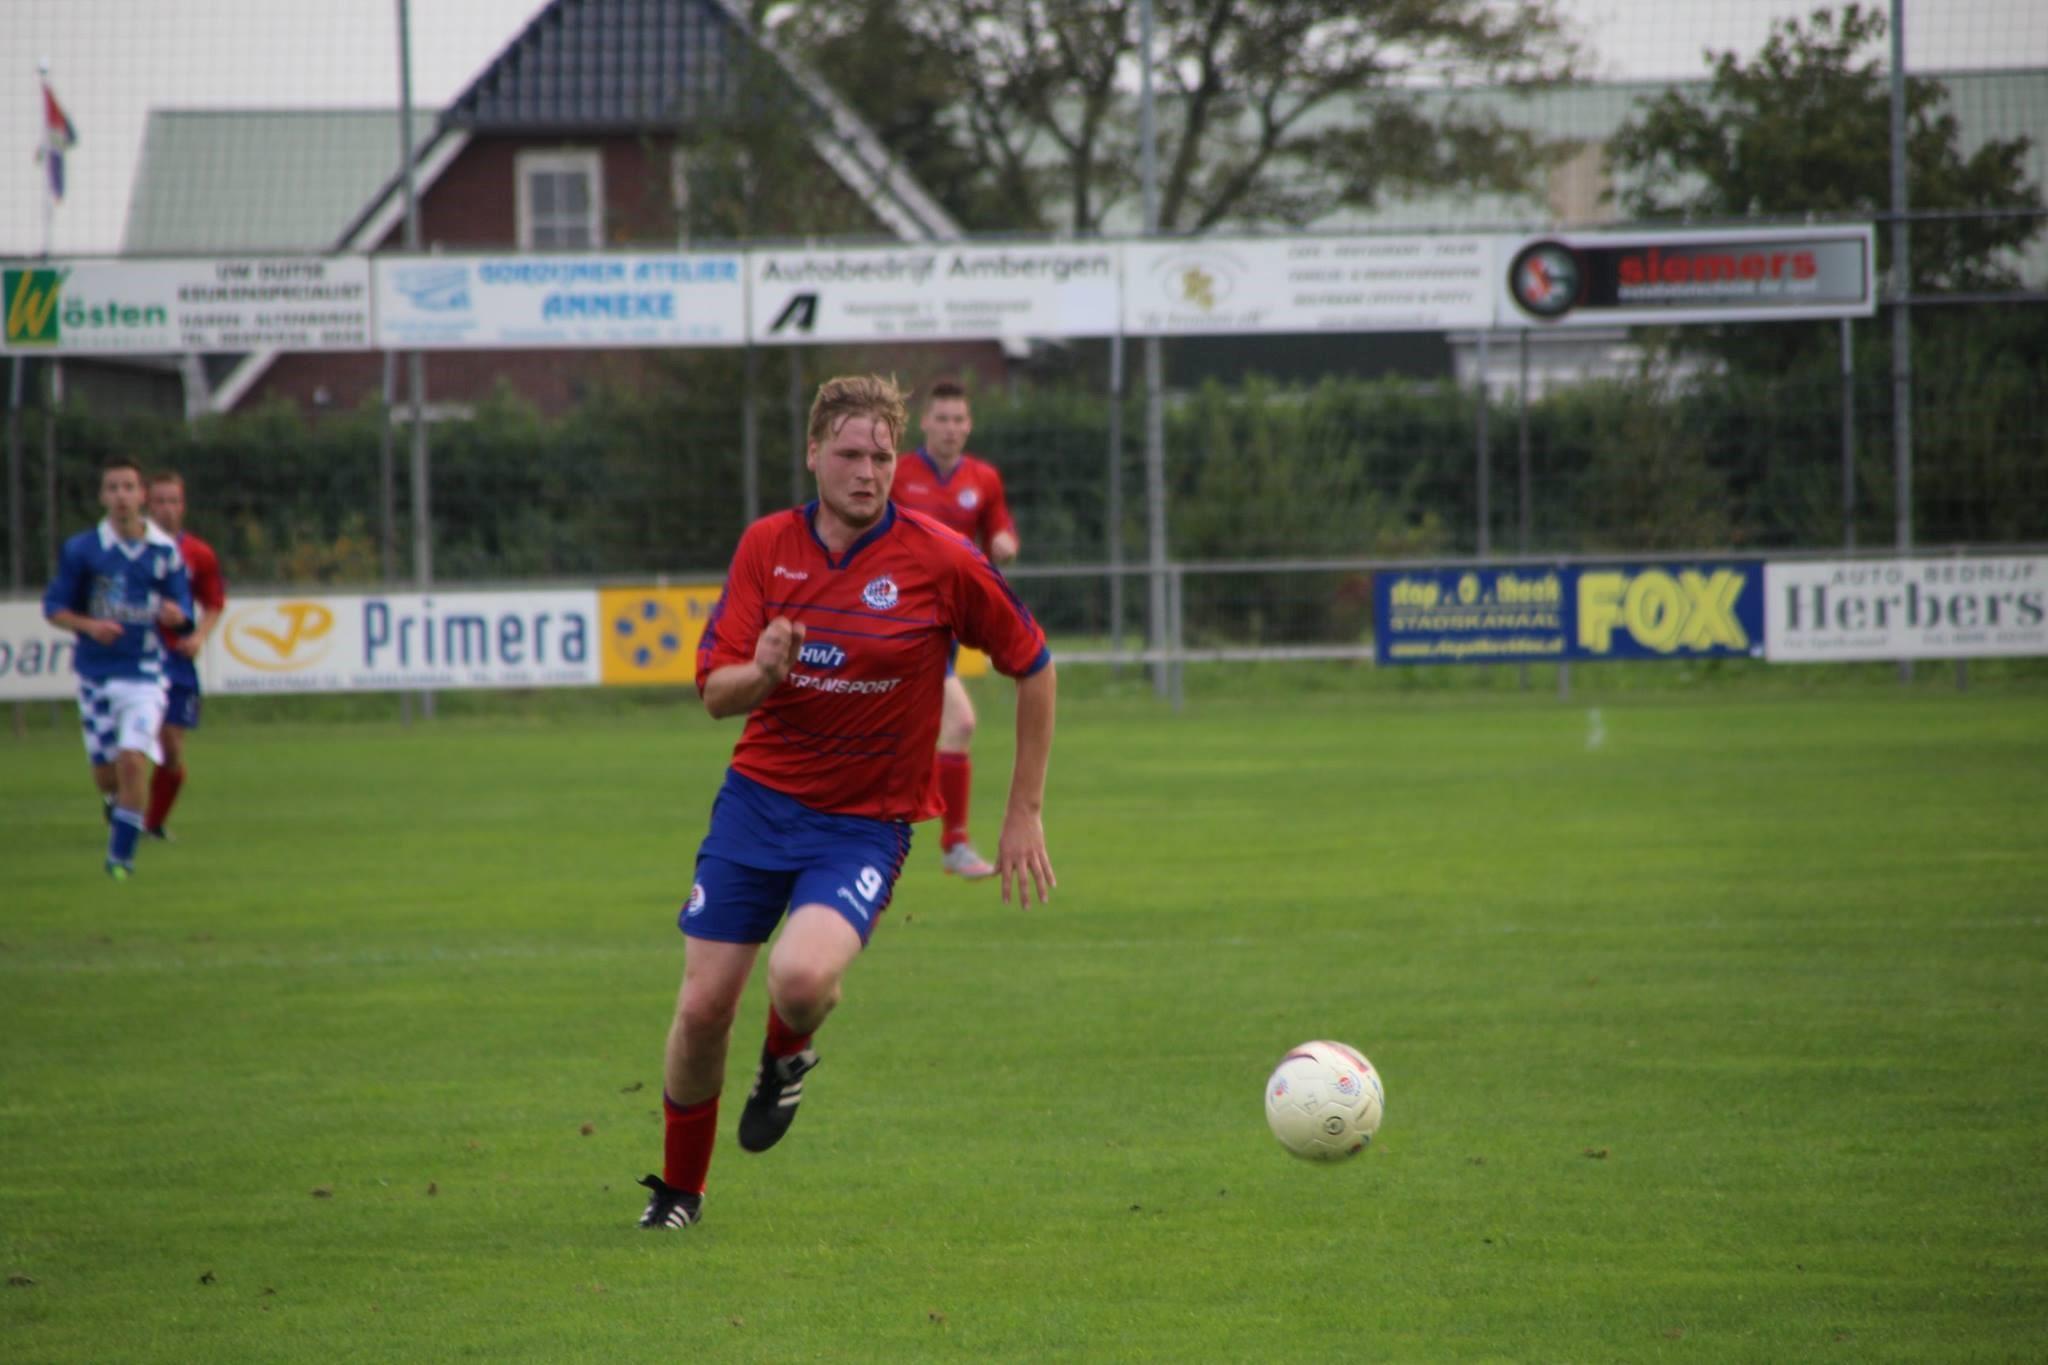 Sport | bd.nl